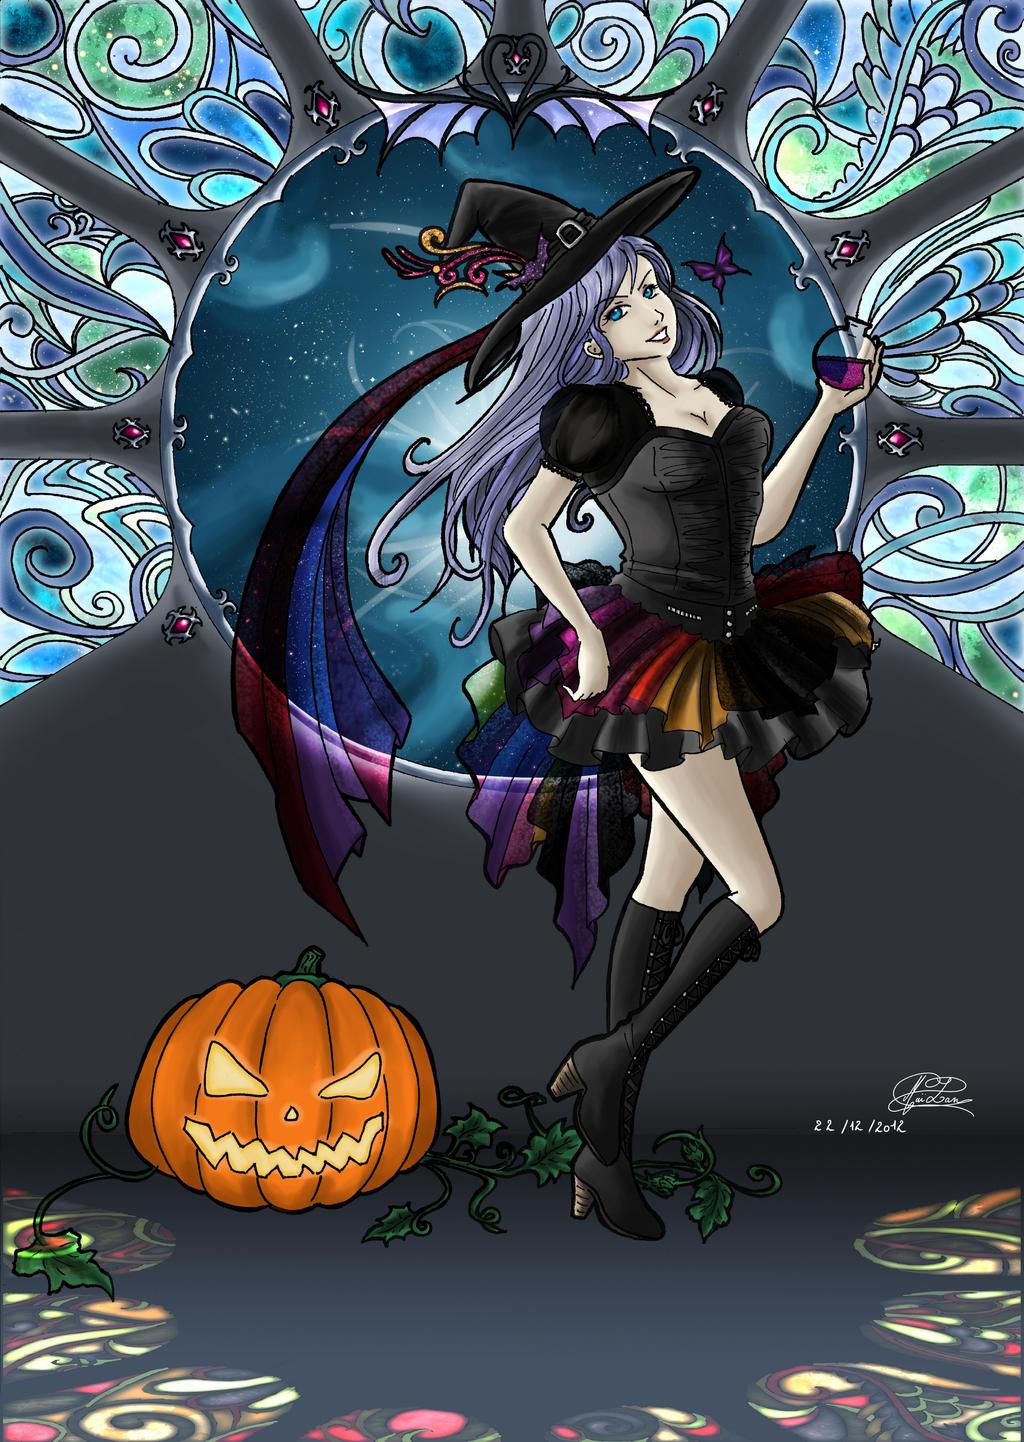 Digital witch by myssbluestar